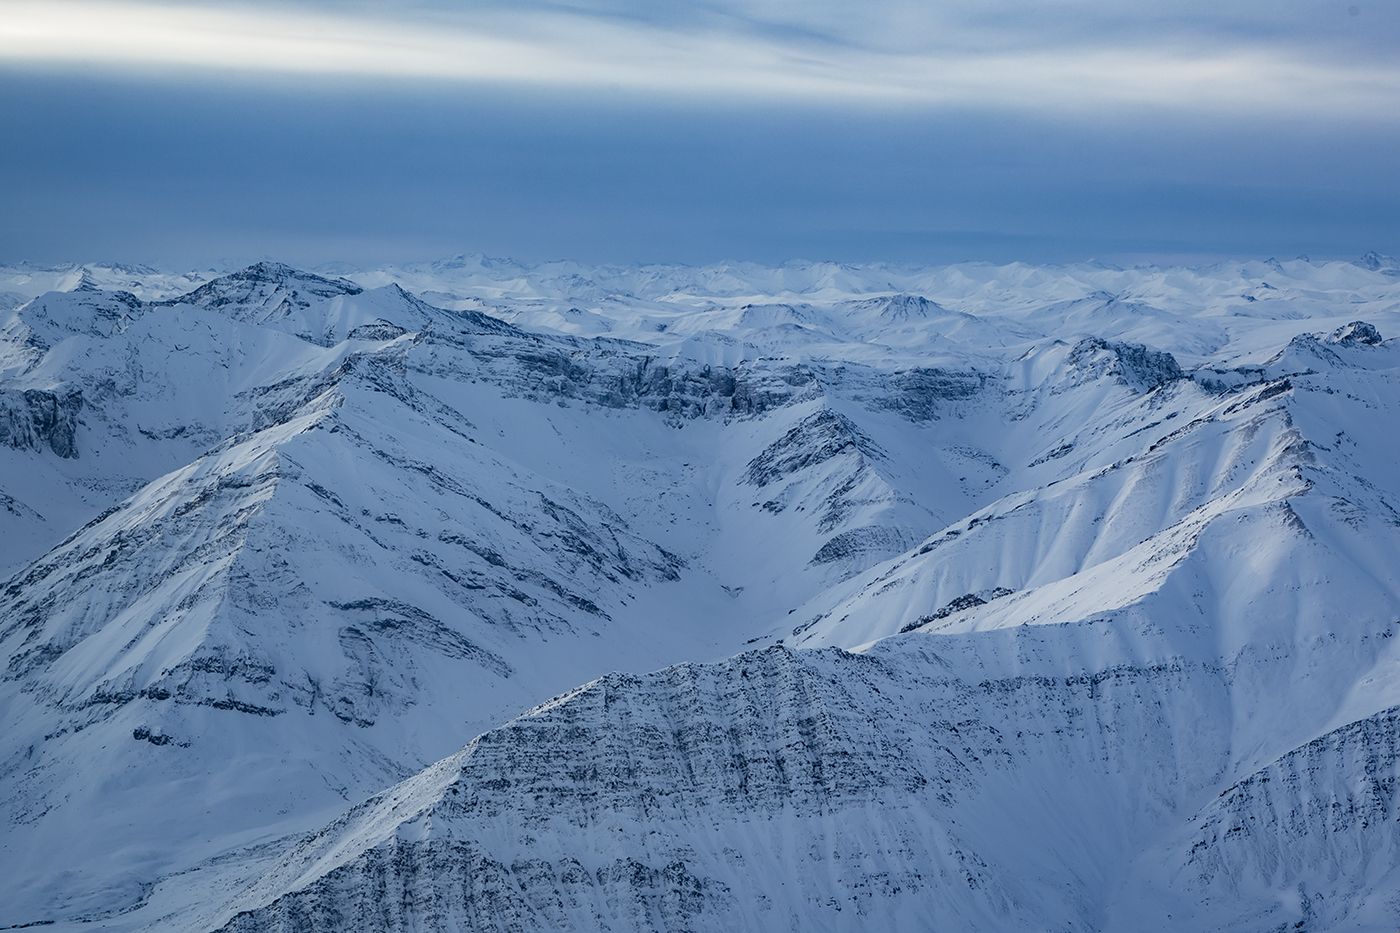 Brooks Range, Gates of the Arctic National Park, Alaska